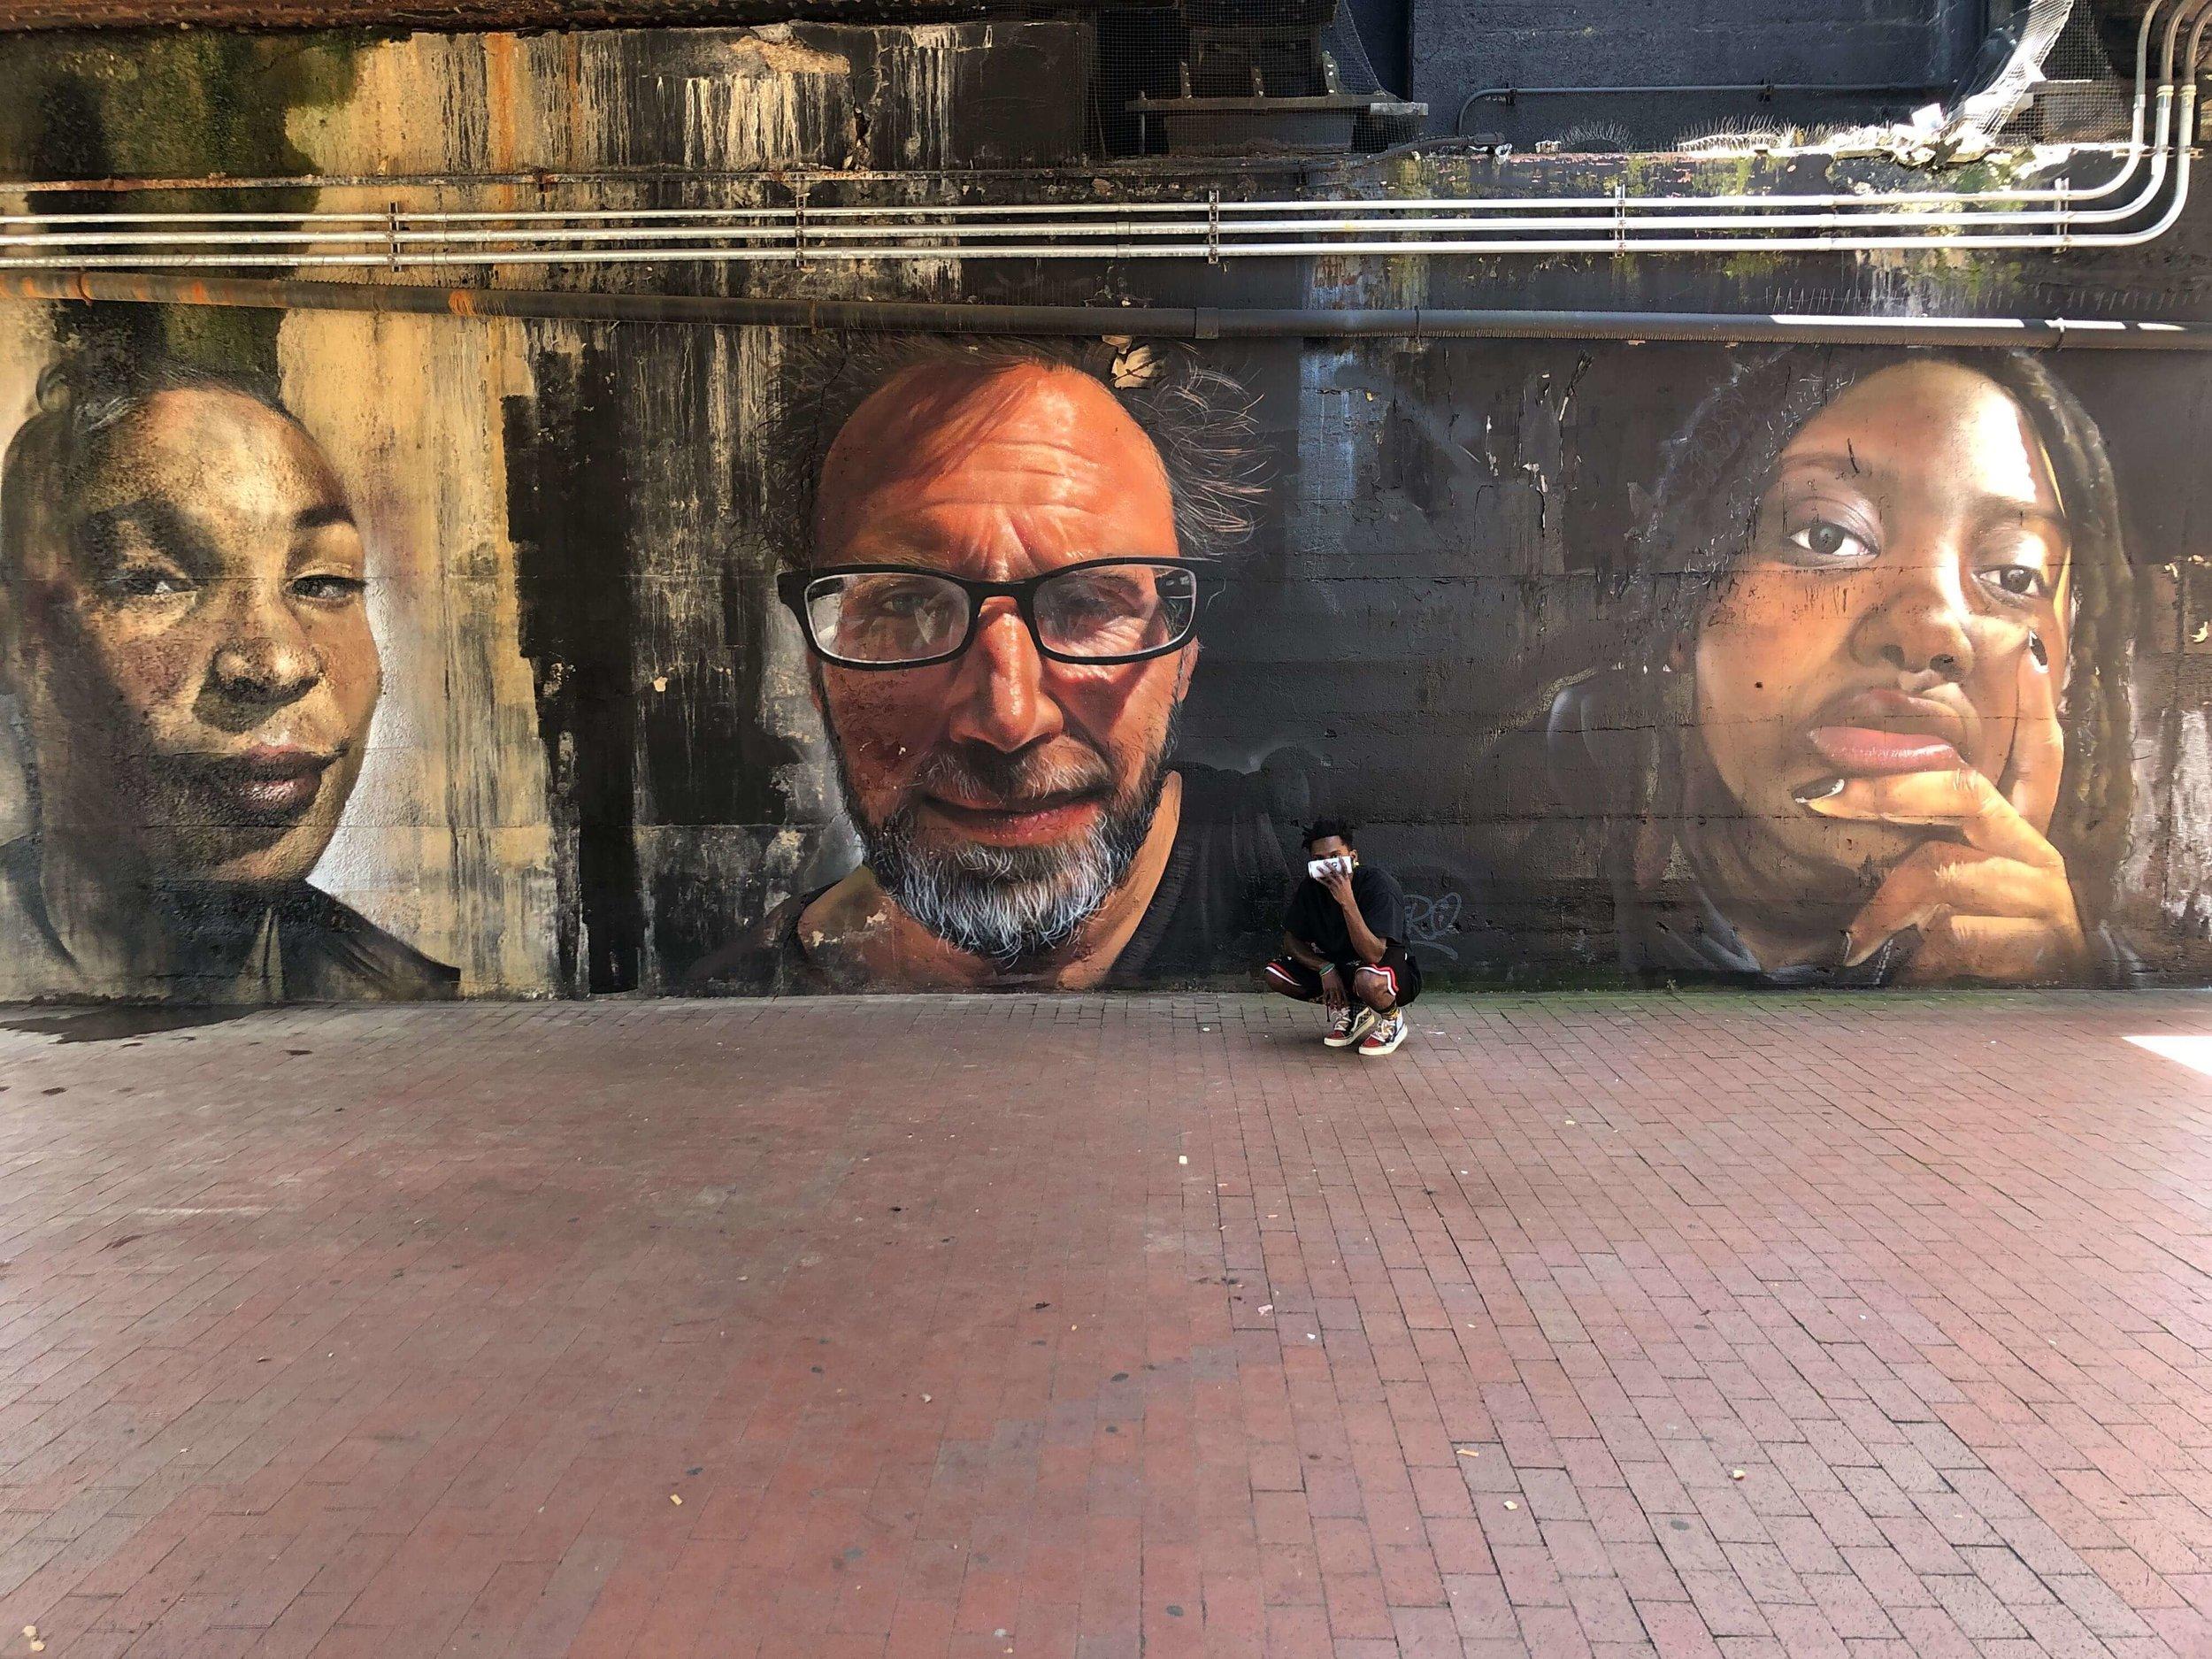 HIERO VEIGA - ⚐ - USALOCATION: 52 Central Square (2019)@hieroveiga